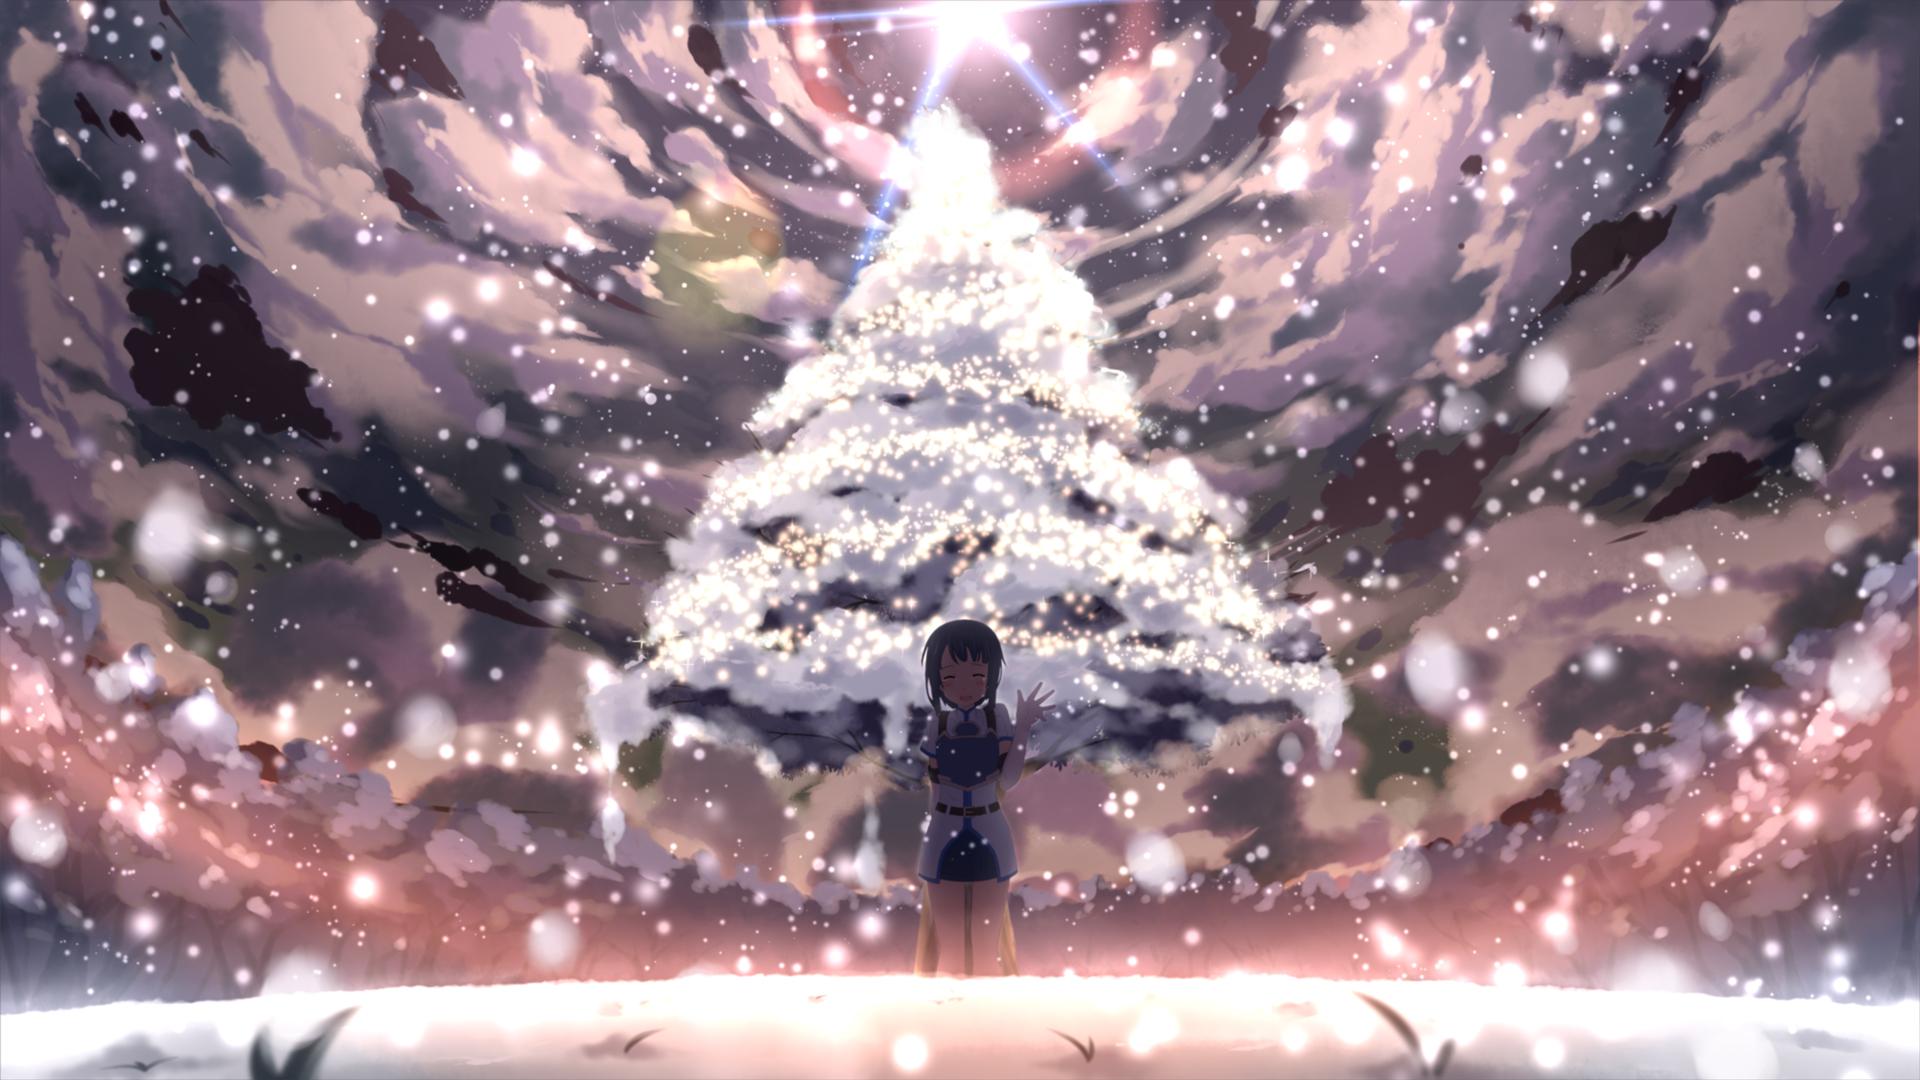 Sword art online hd wallpaper background image - Anime christmas wallpaper ...